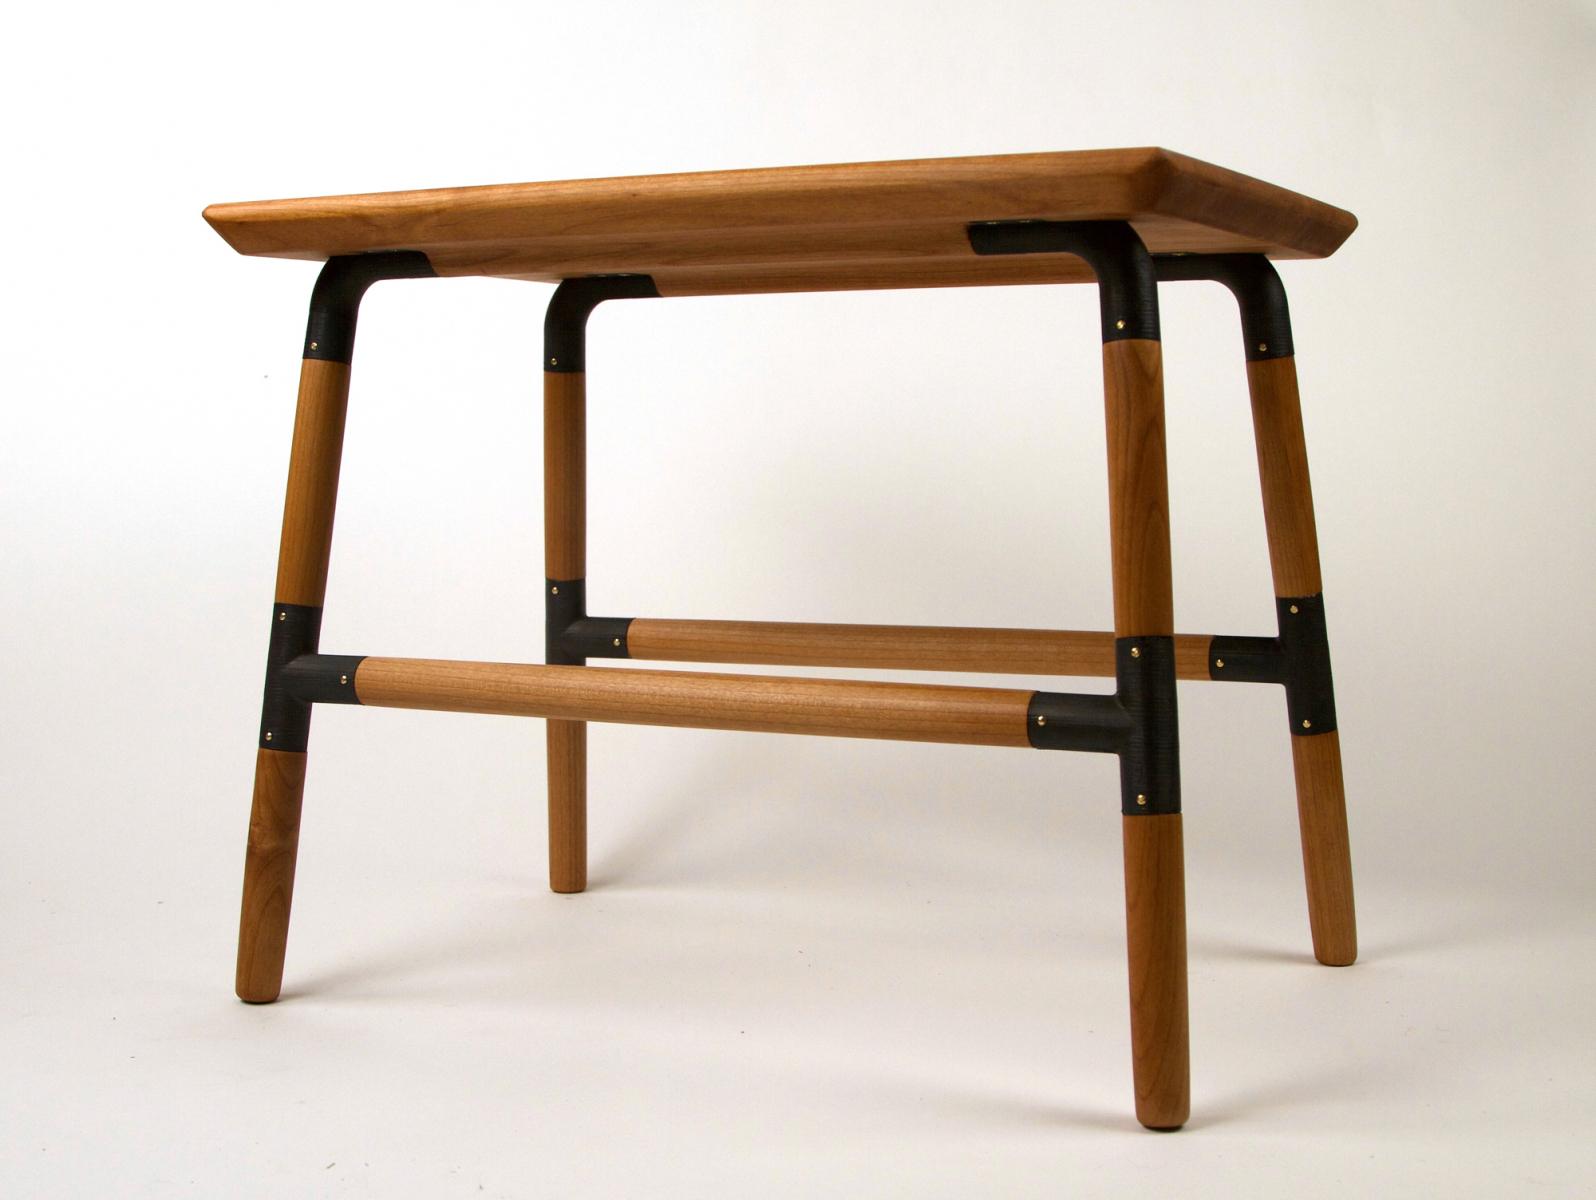 Table2_main_smallerjpg